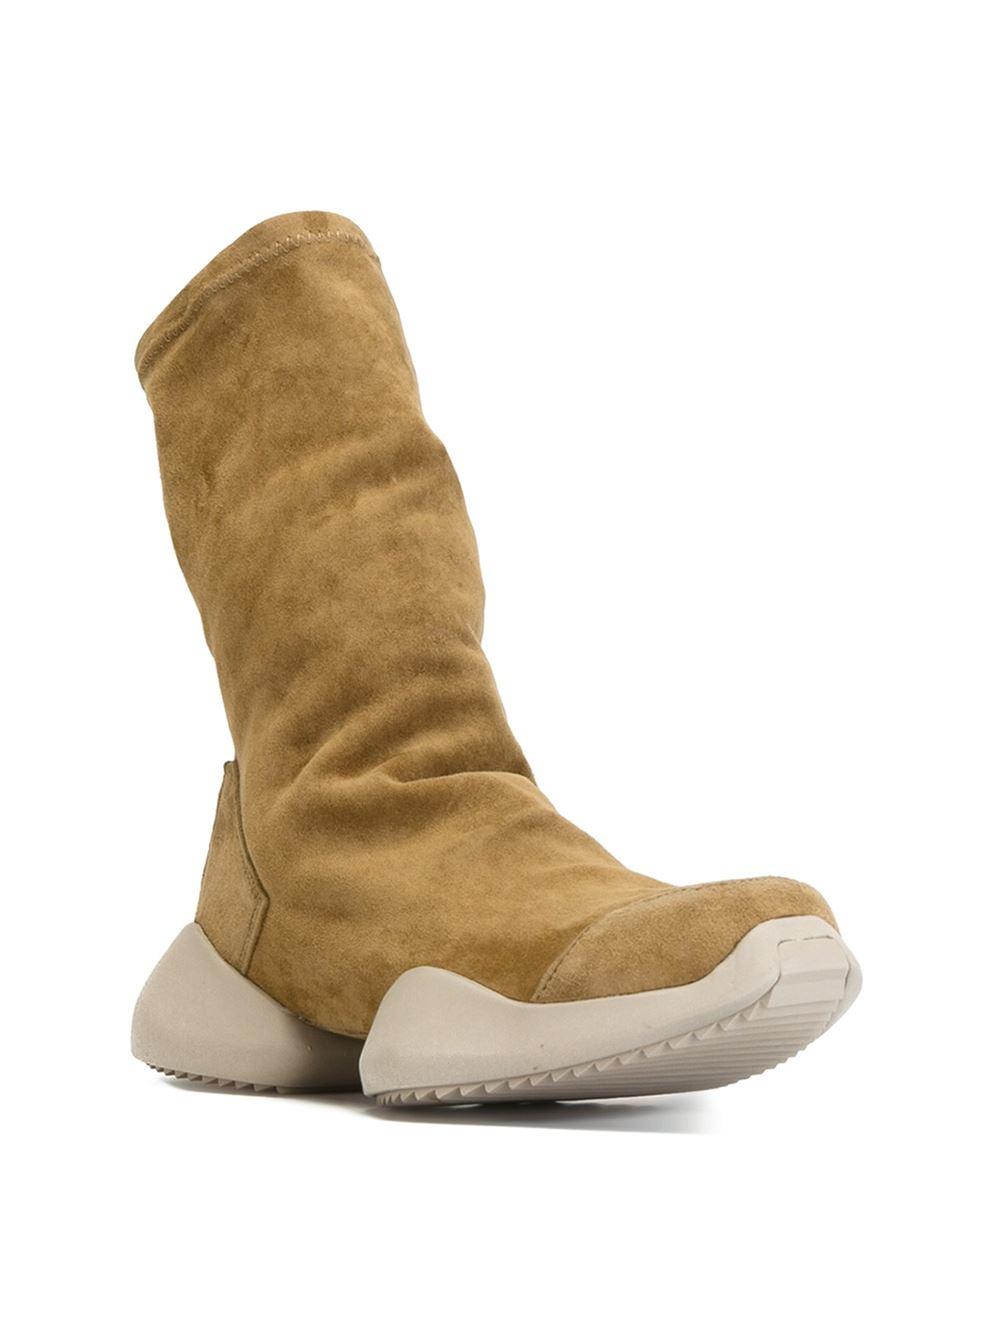 adidas tech boots